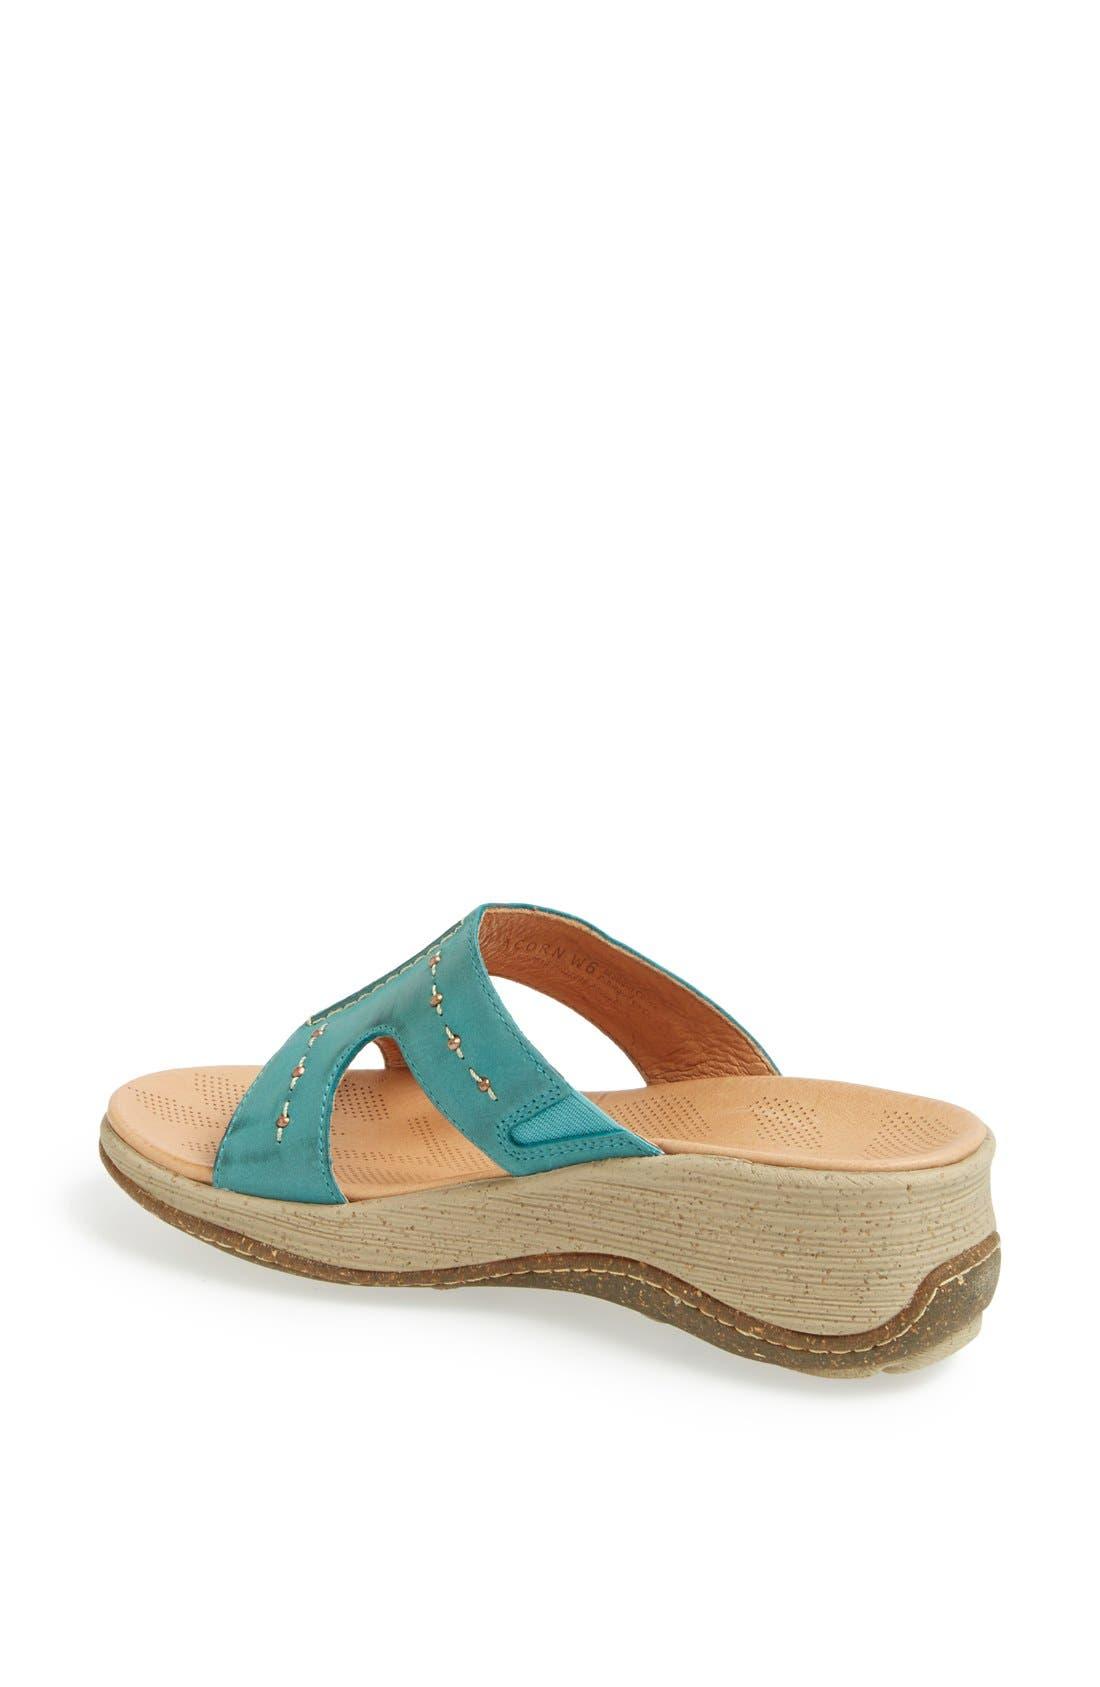 Alternate Image 2  - Acorn 'Vista' Wedge Sandal